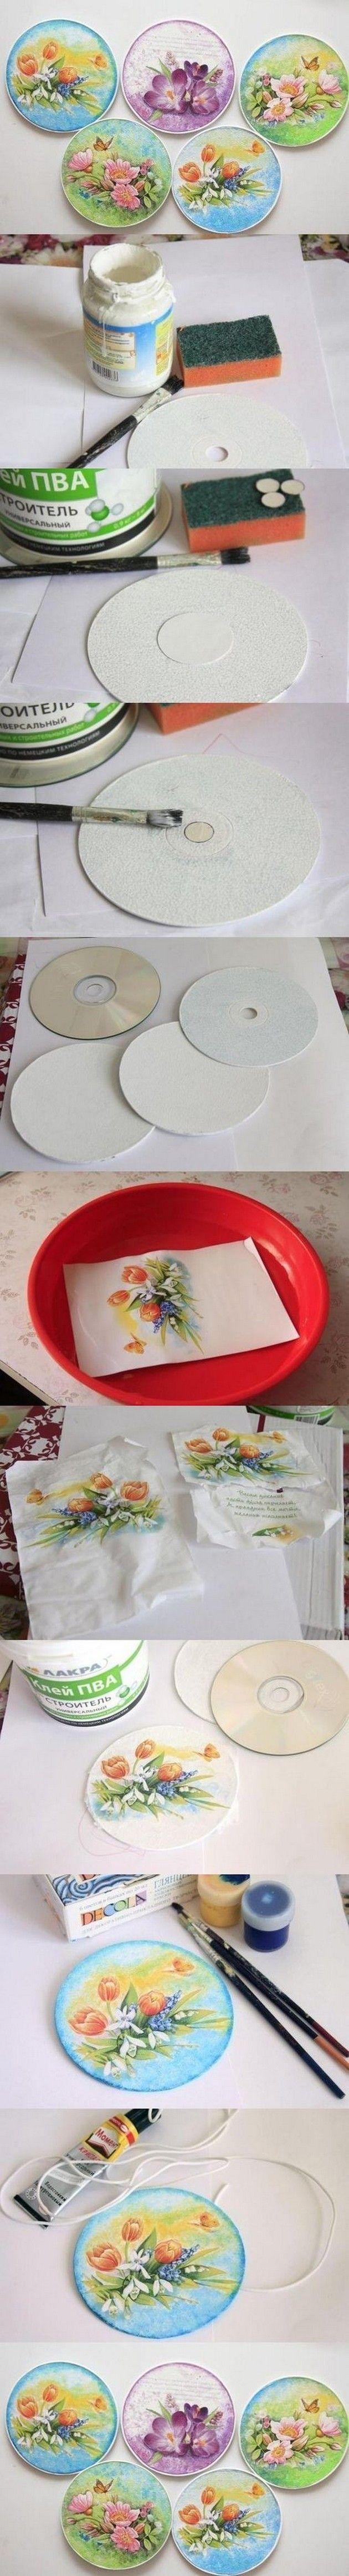 Craft with CDs Ideas and InspirationVitamin-Ha | Vitamin-Ha